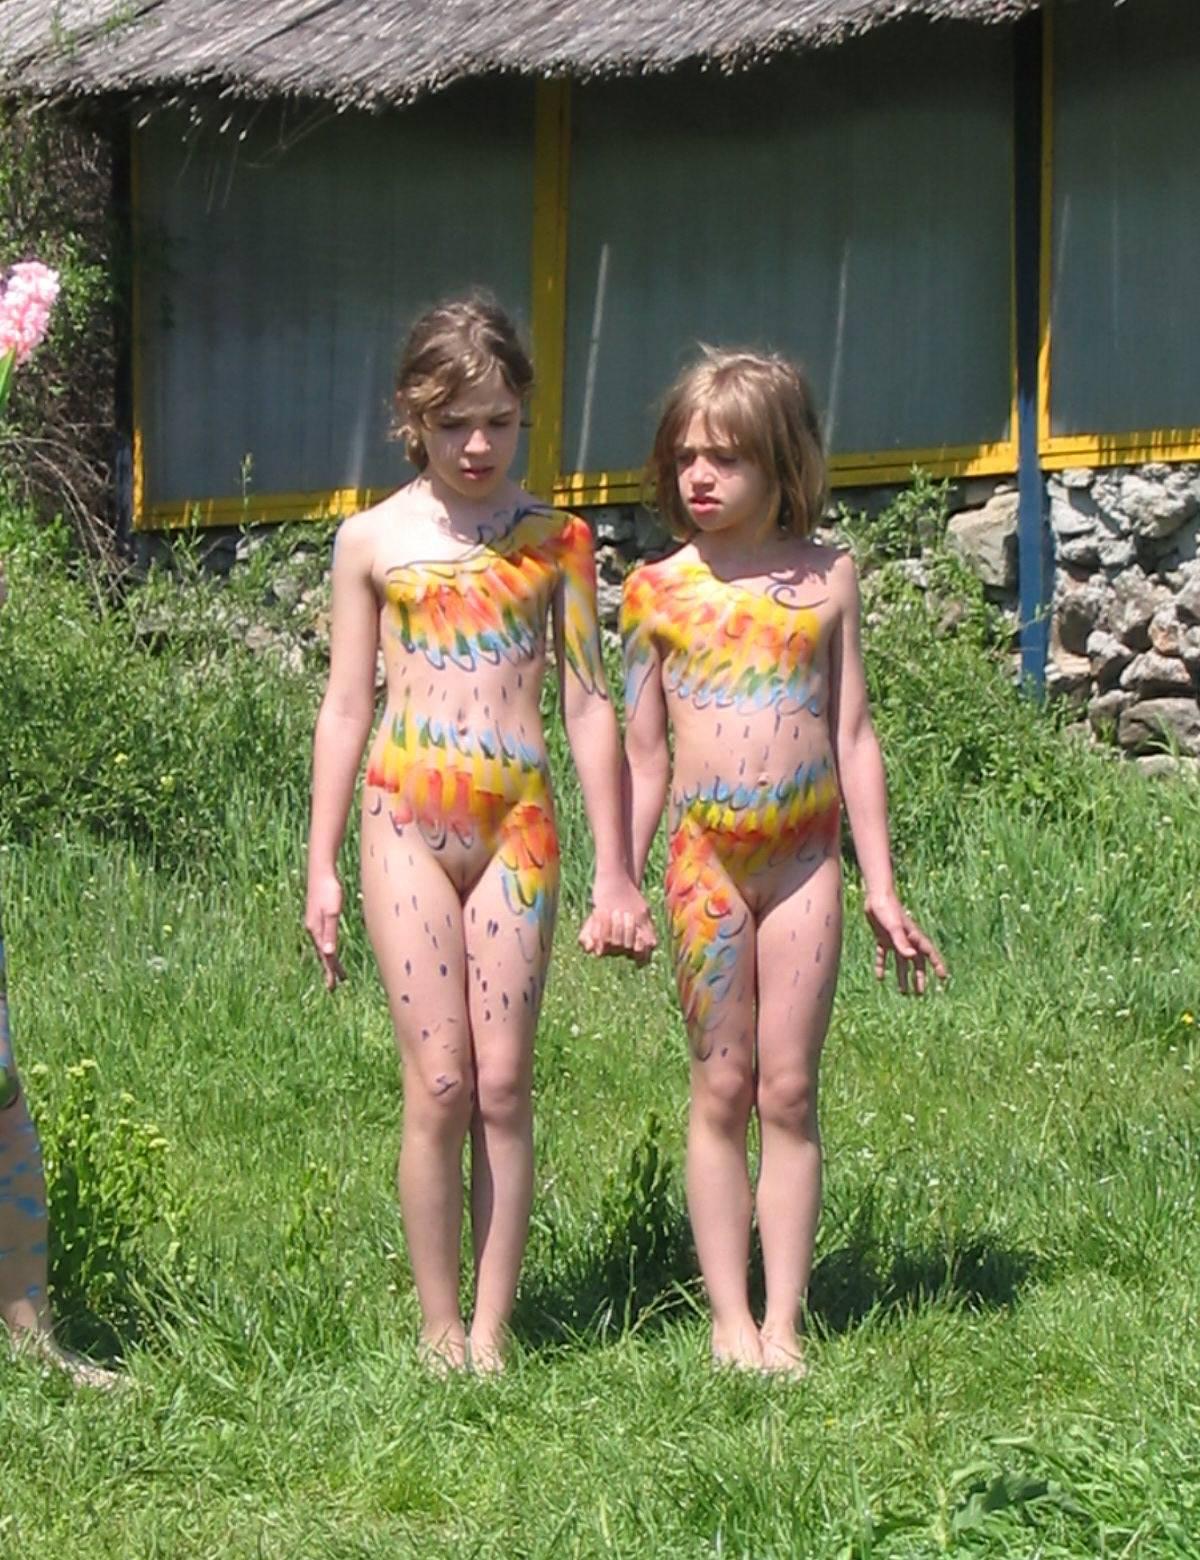 Nudist Pics Odessa Green Field Family - 2